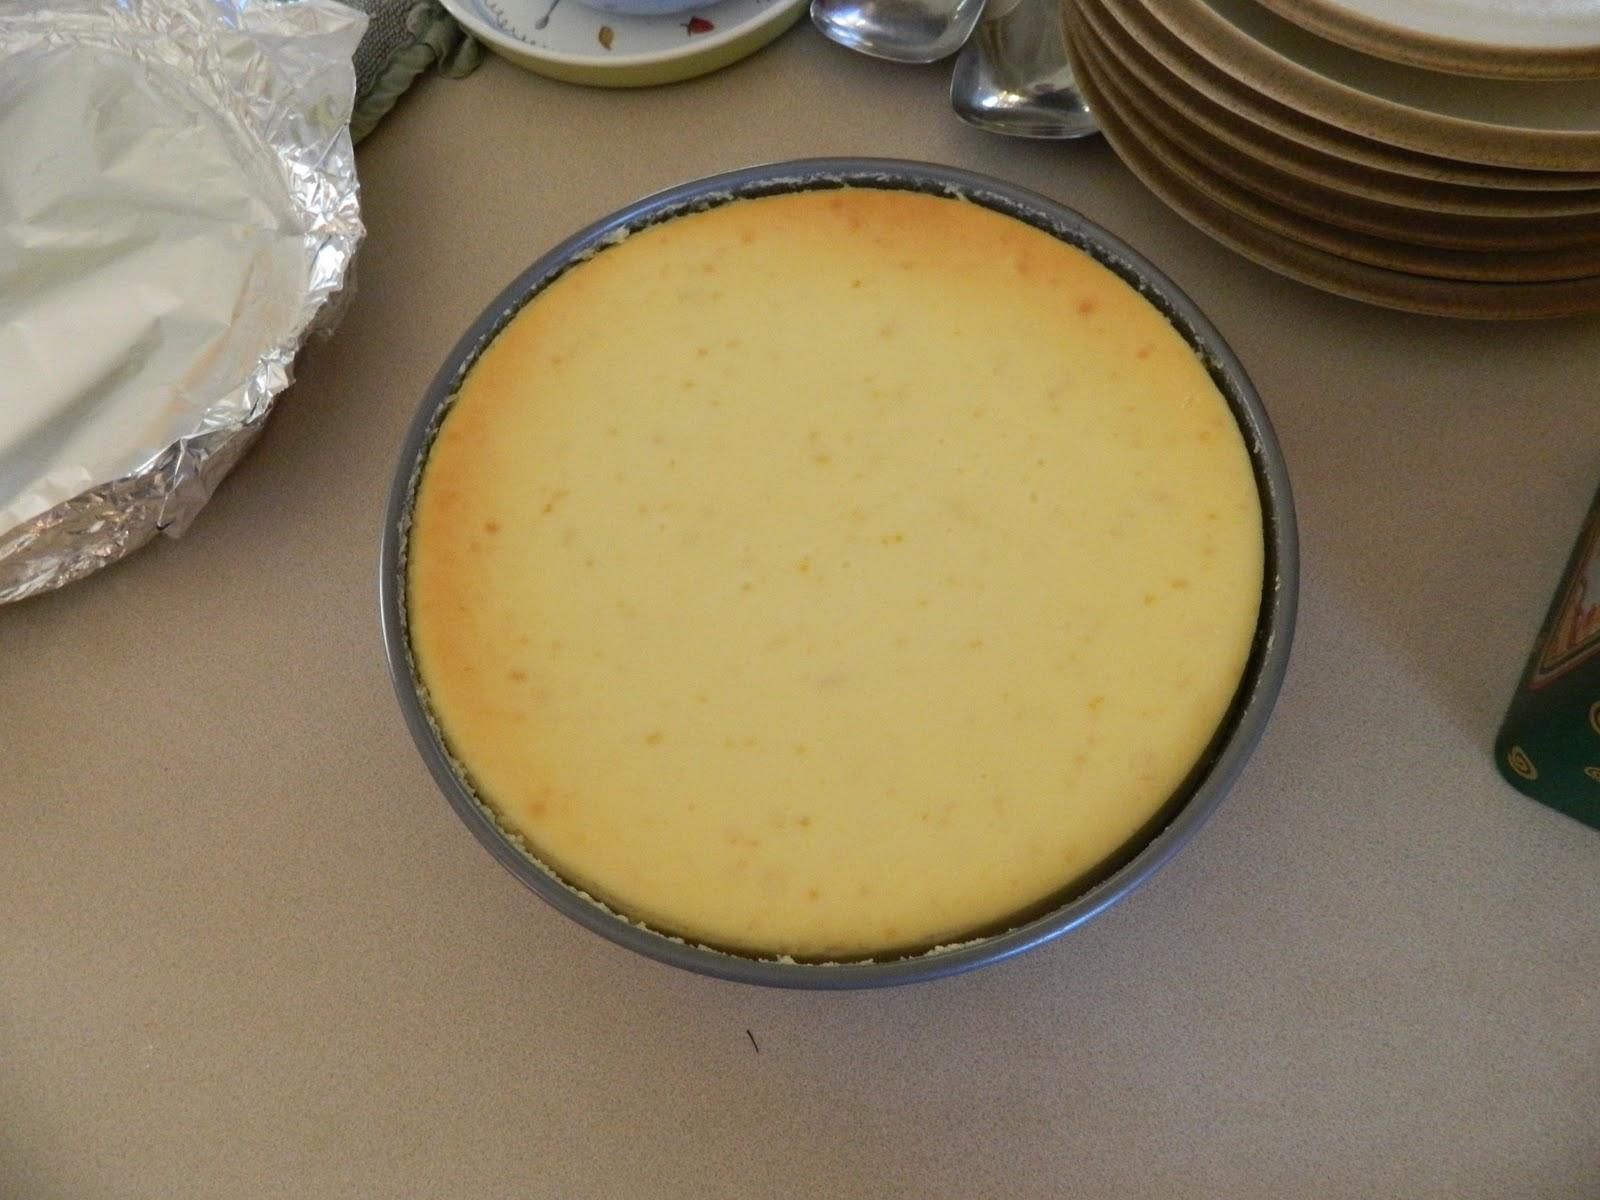 jaimalaya: Homemade Friday: Lemon Cheesecake with ...